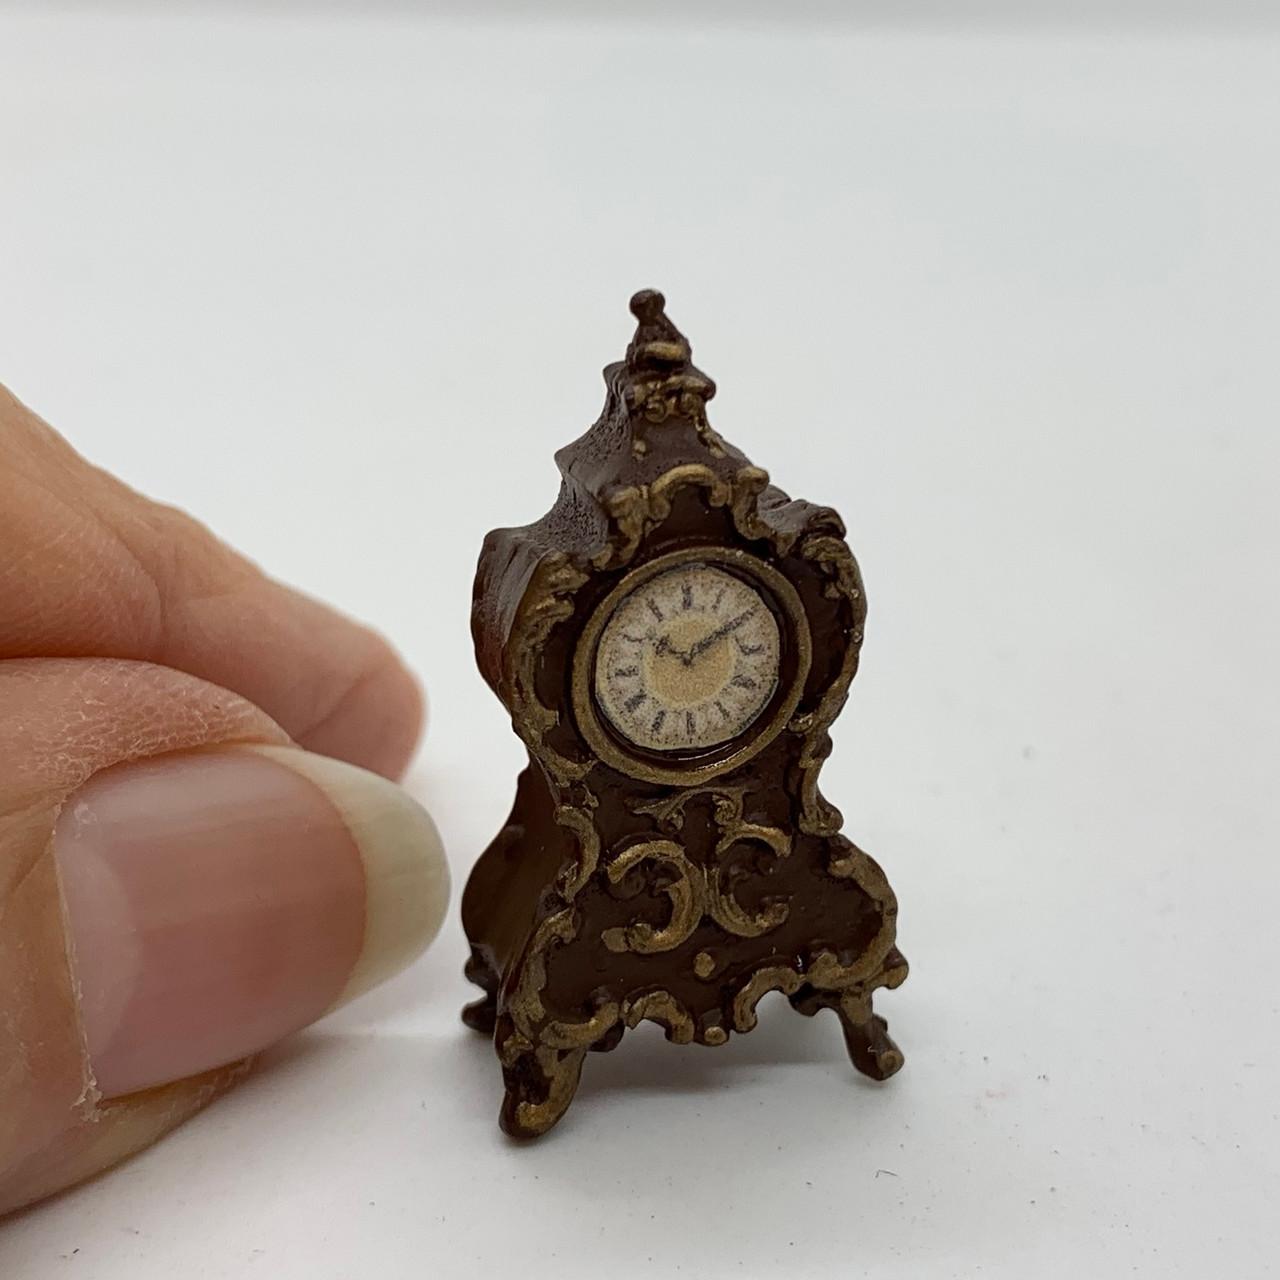 Ornate Mantle Clock (MUL2894C)